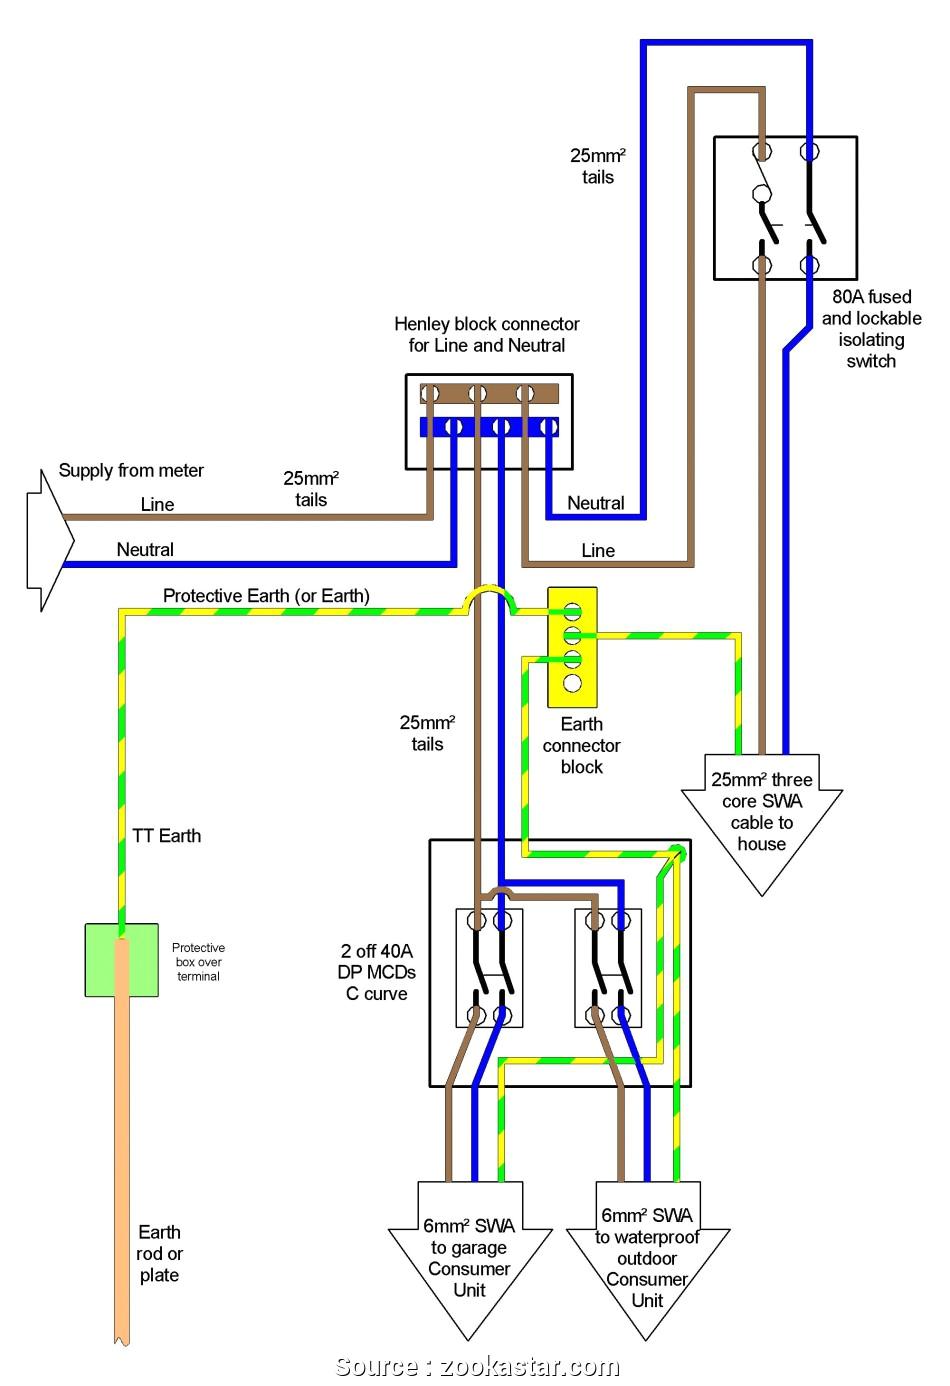 17th Edition Consumer Unit Wiring Diagram Wiring Diagram for Mk Garage Kit Wiring Diagram Expert